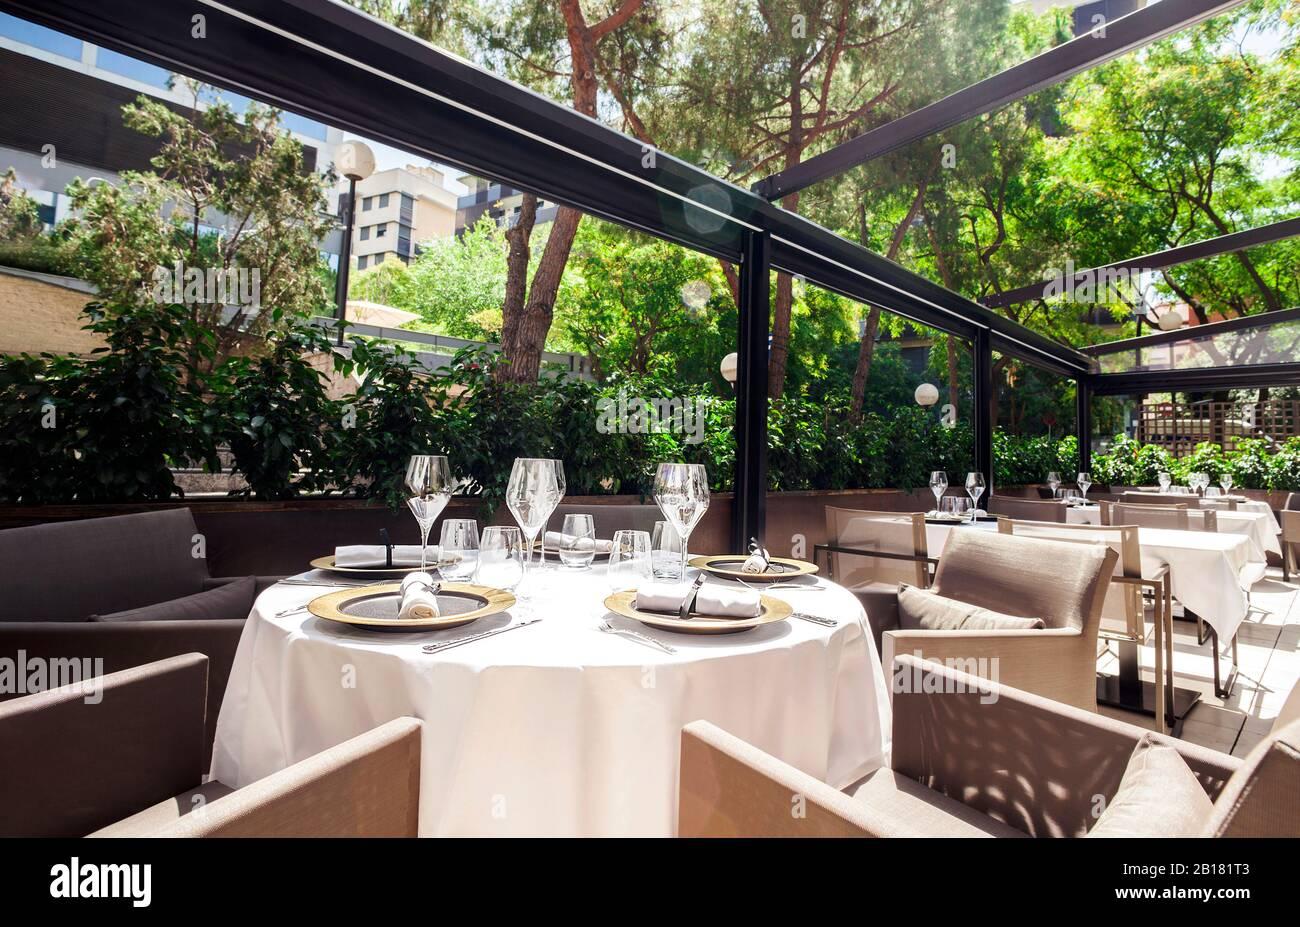 Elegante Terrasse im Restaurant Stockfotografie   Alamy